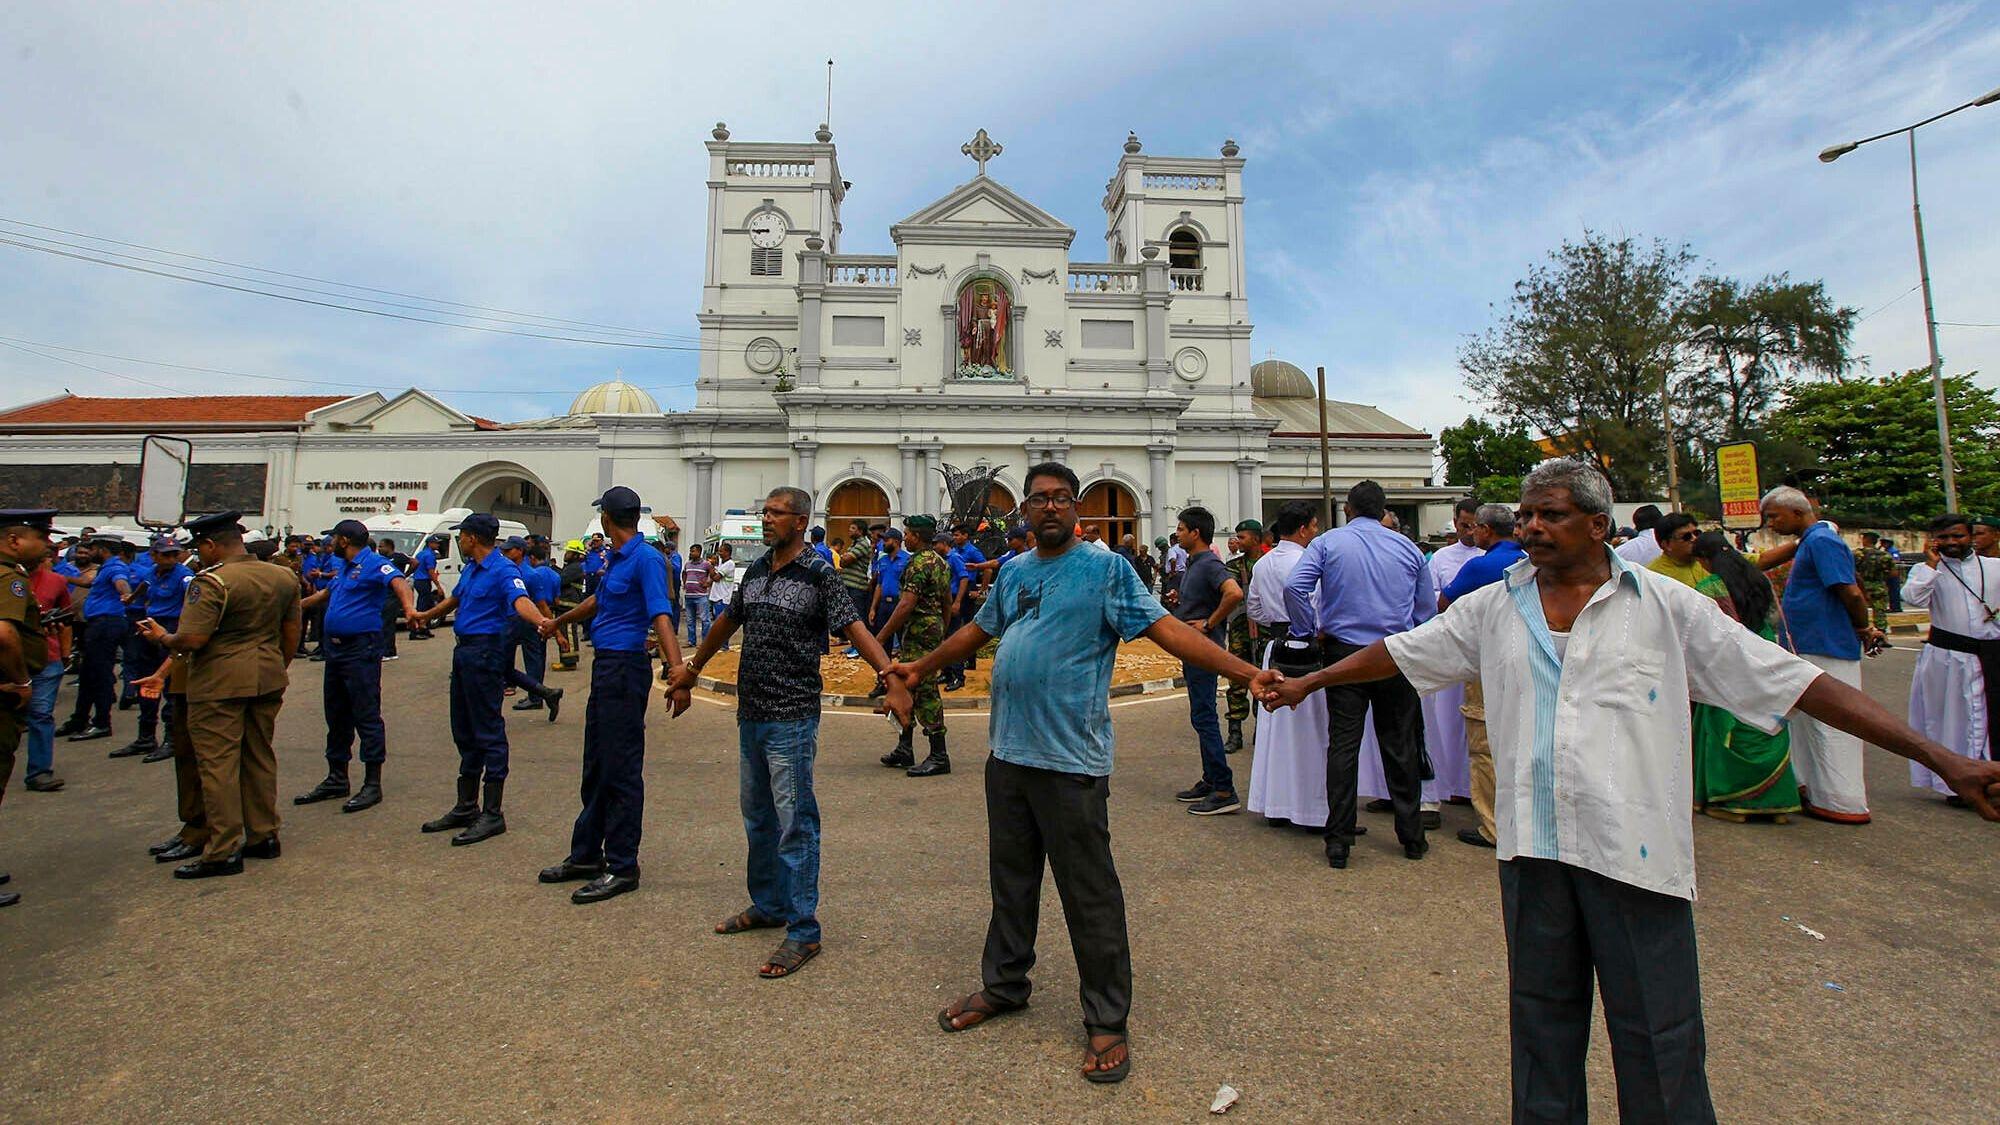 Sri Lanka Blasts: World Leaders Condemn Attack as Death Toll Rises